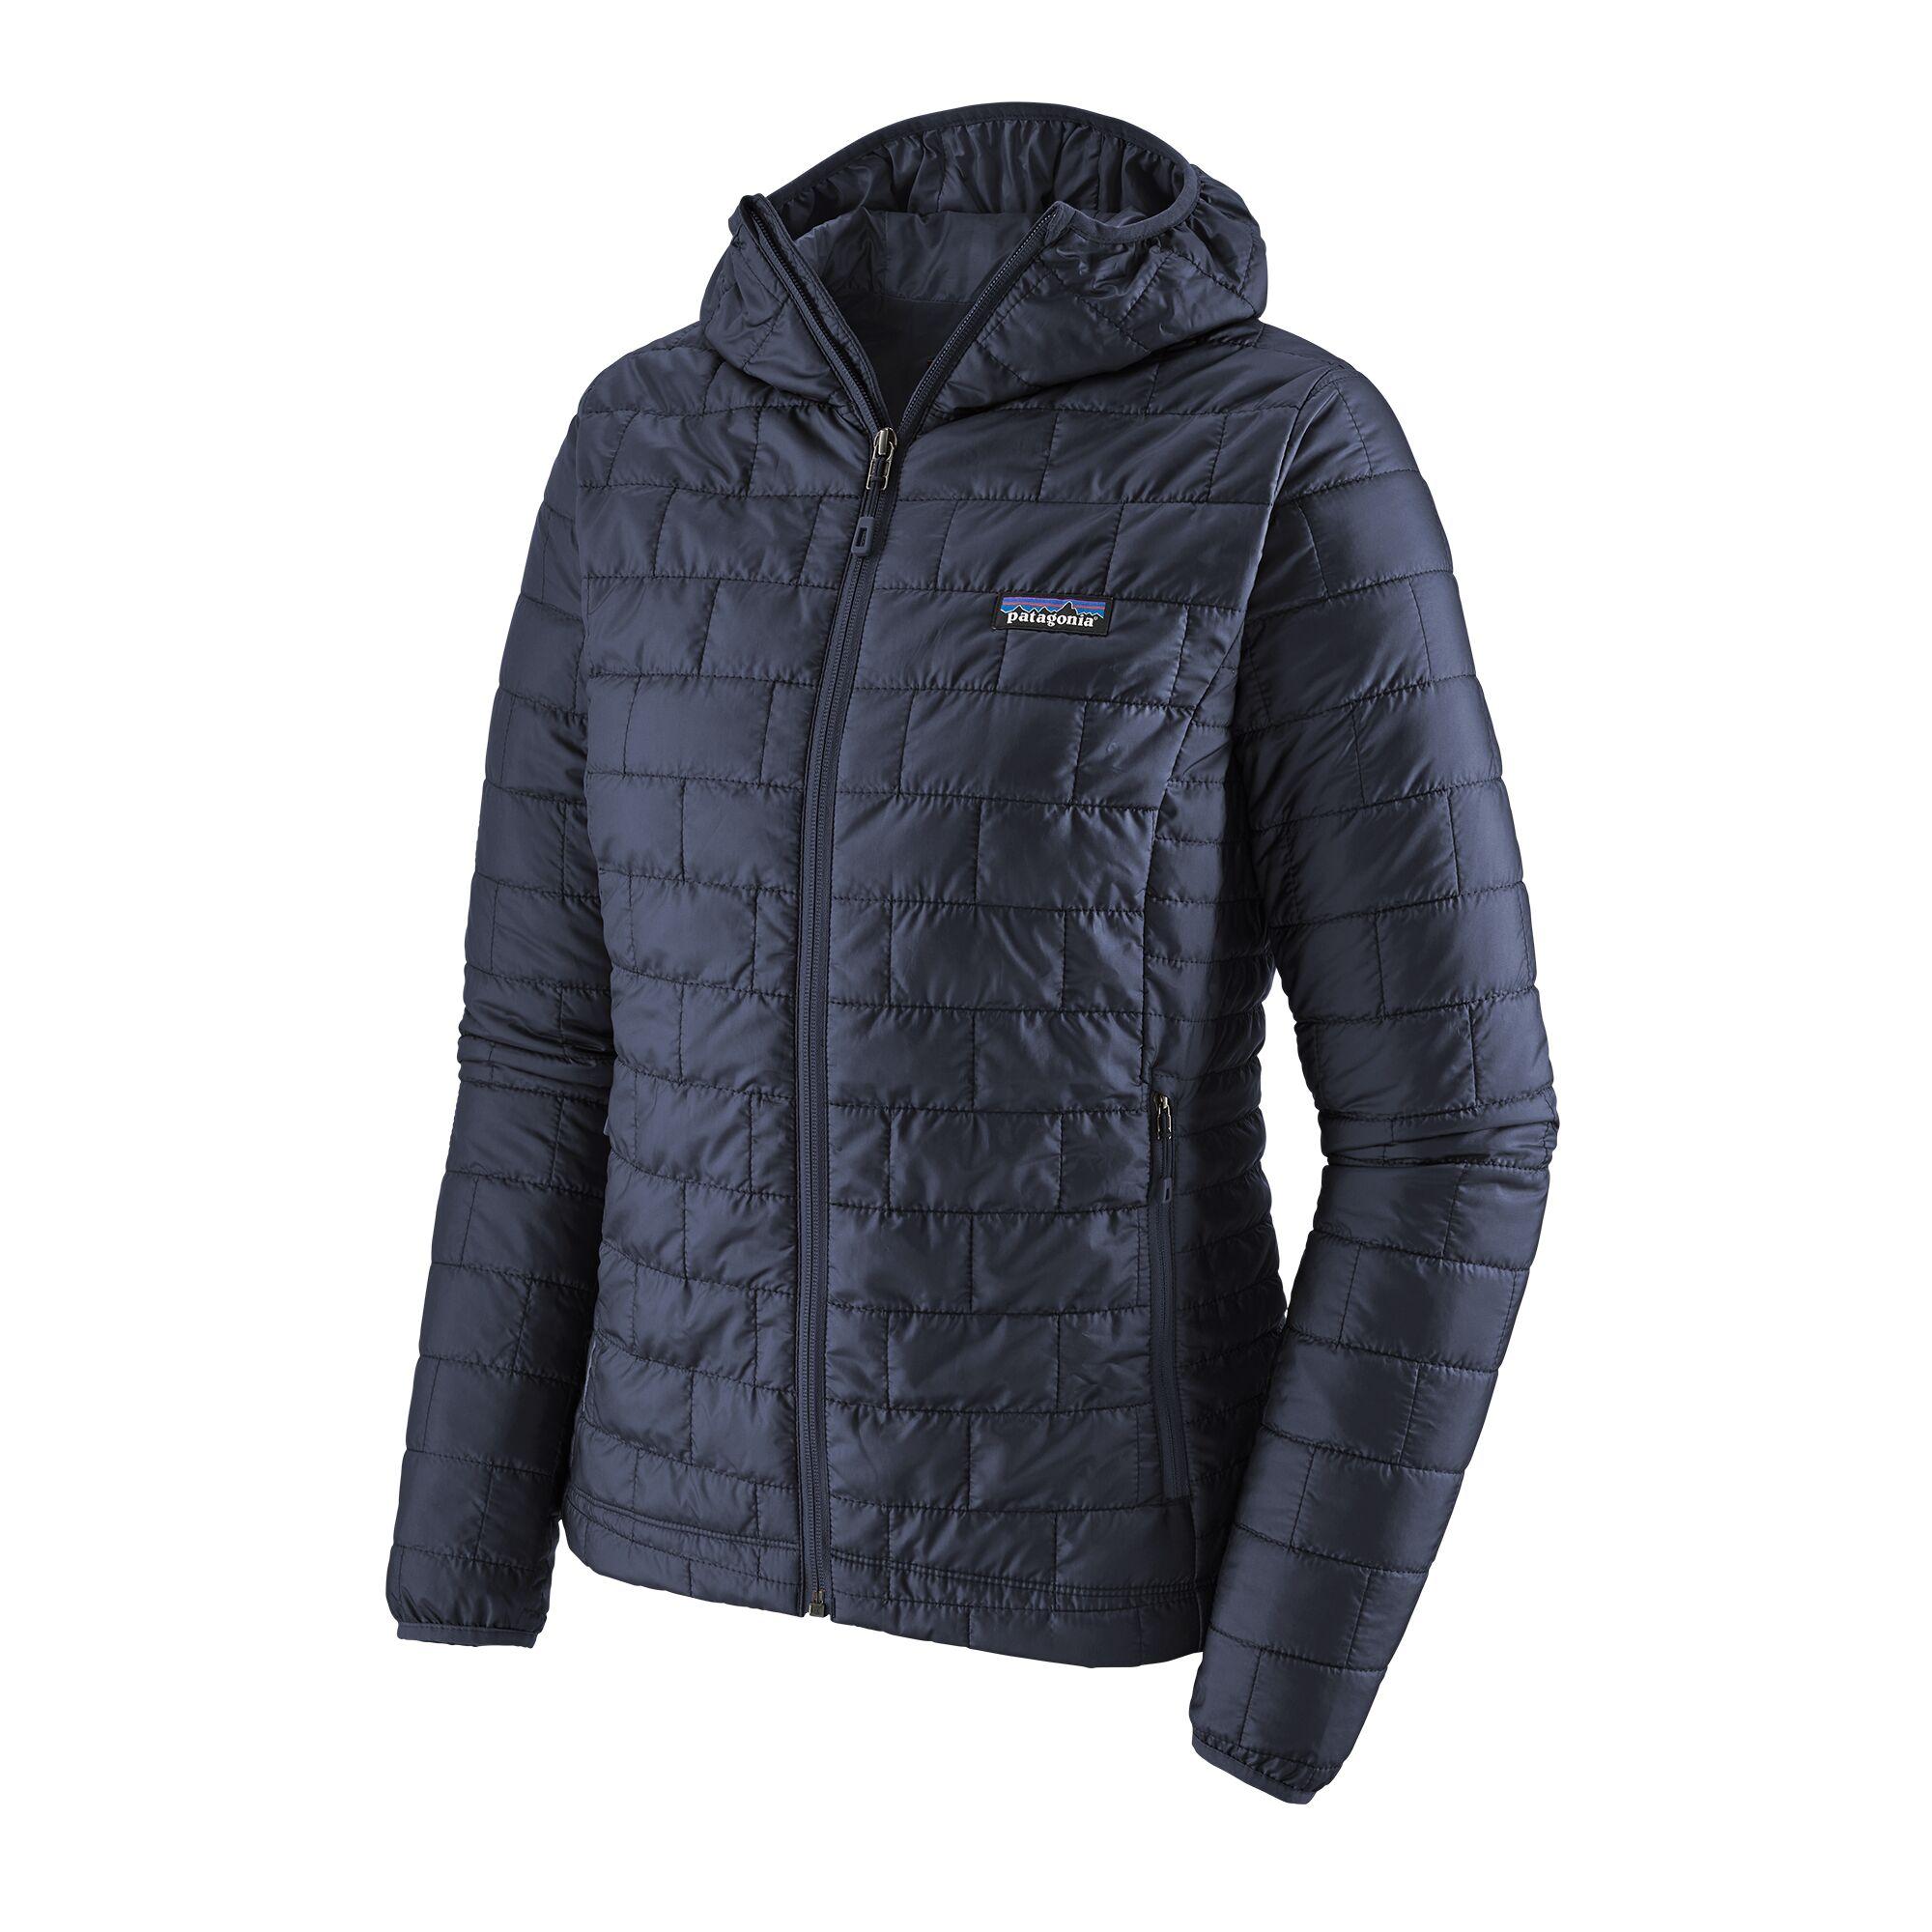 Patagonia - Nano Puff® Hoody - Insulated jacket - Women's